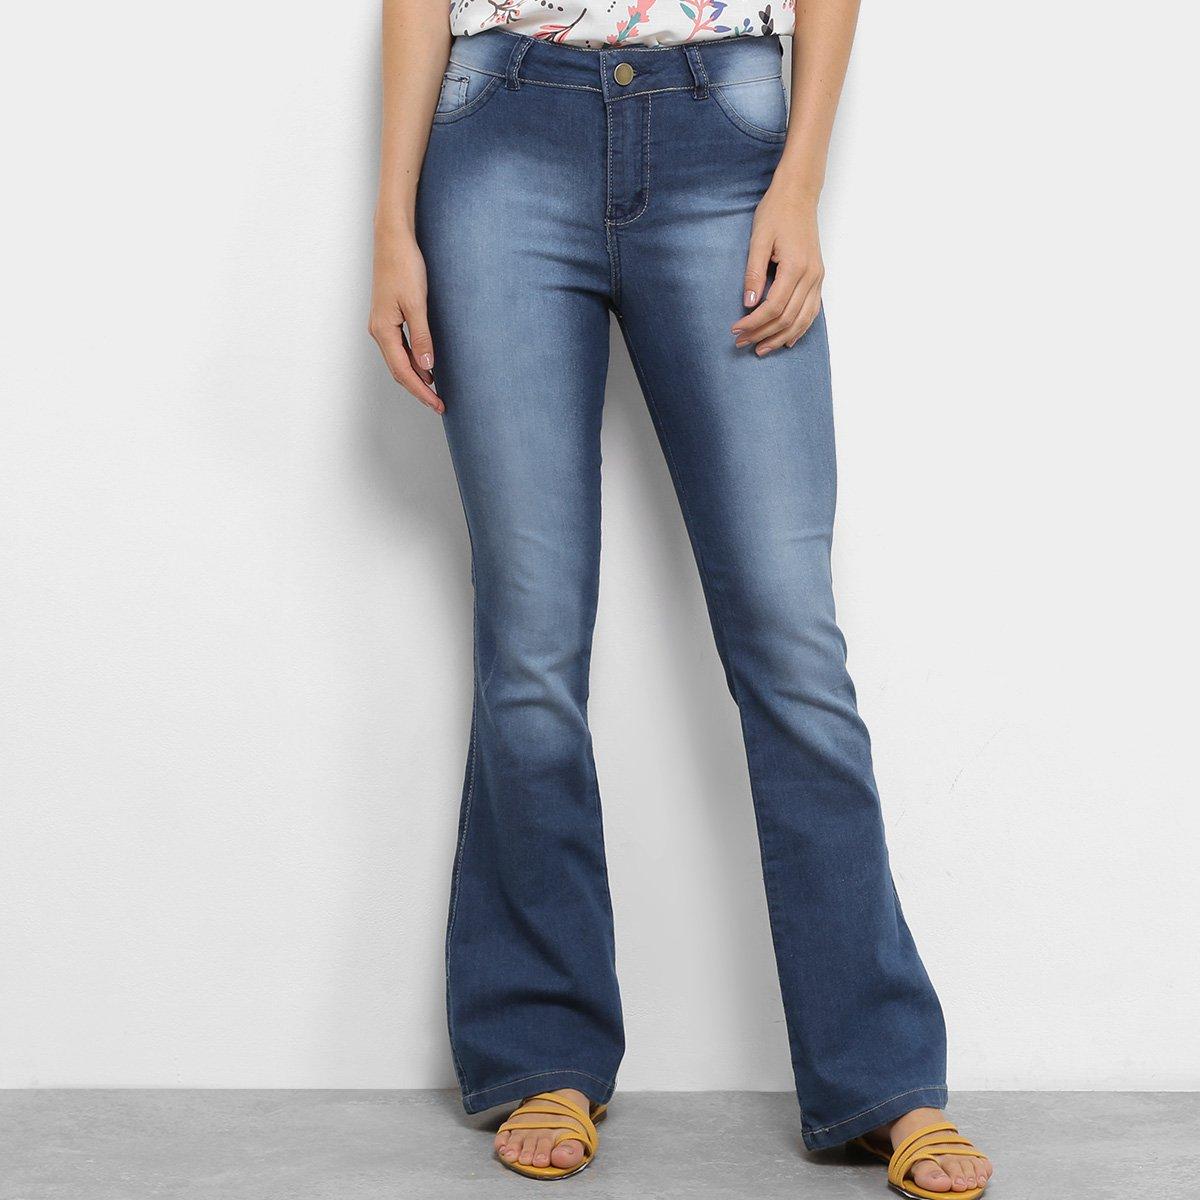 Calça Jeans Flare Coffee Estonada Cintura Alta Feminina - Azul ... 85393afae6